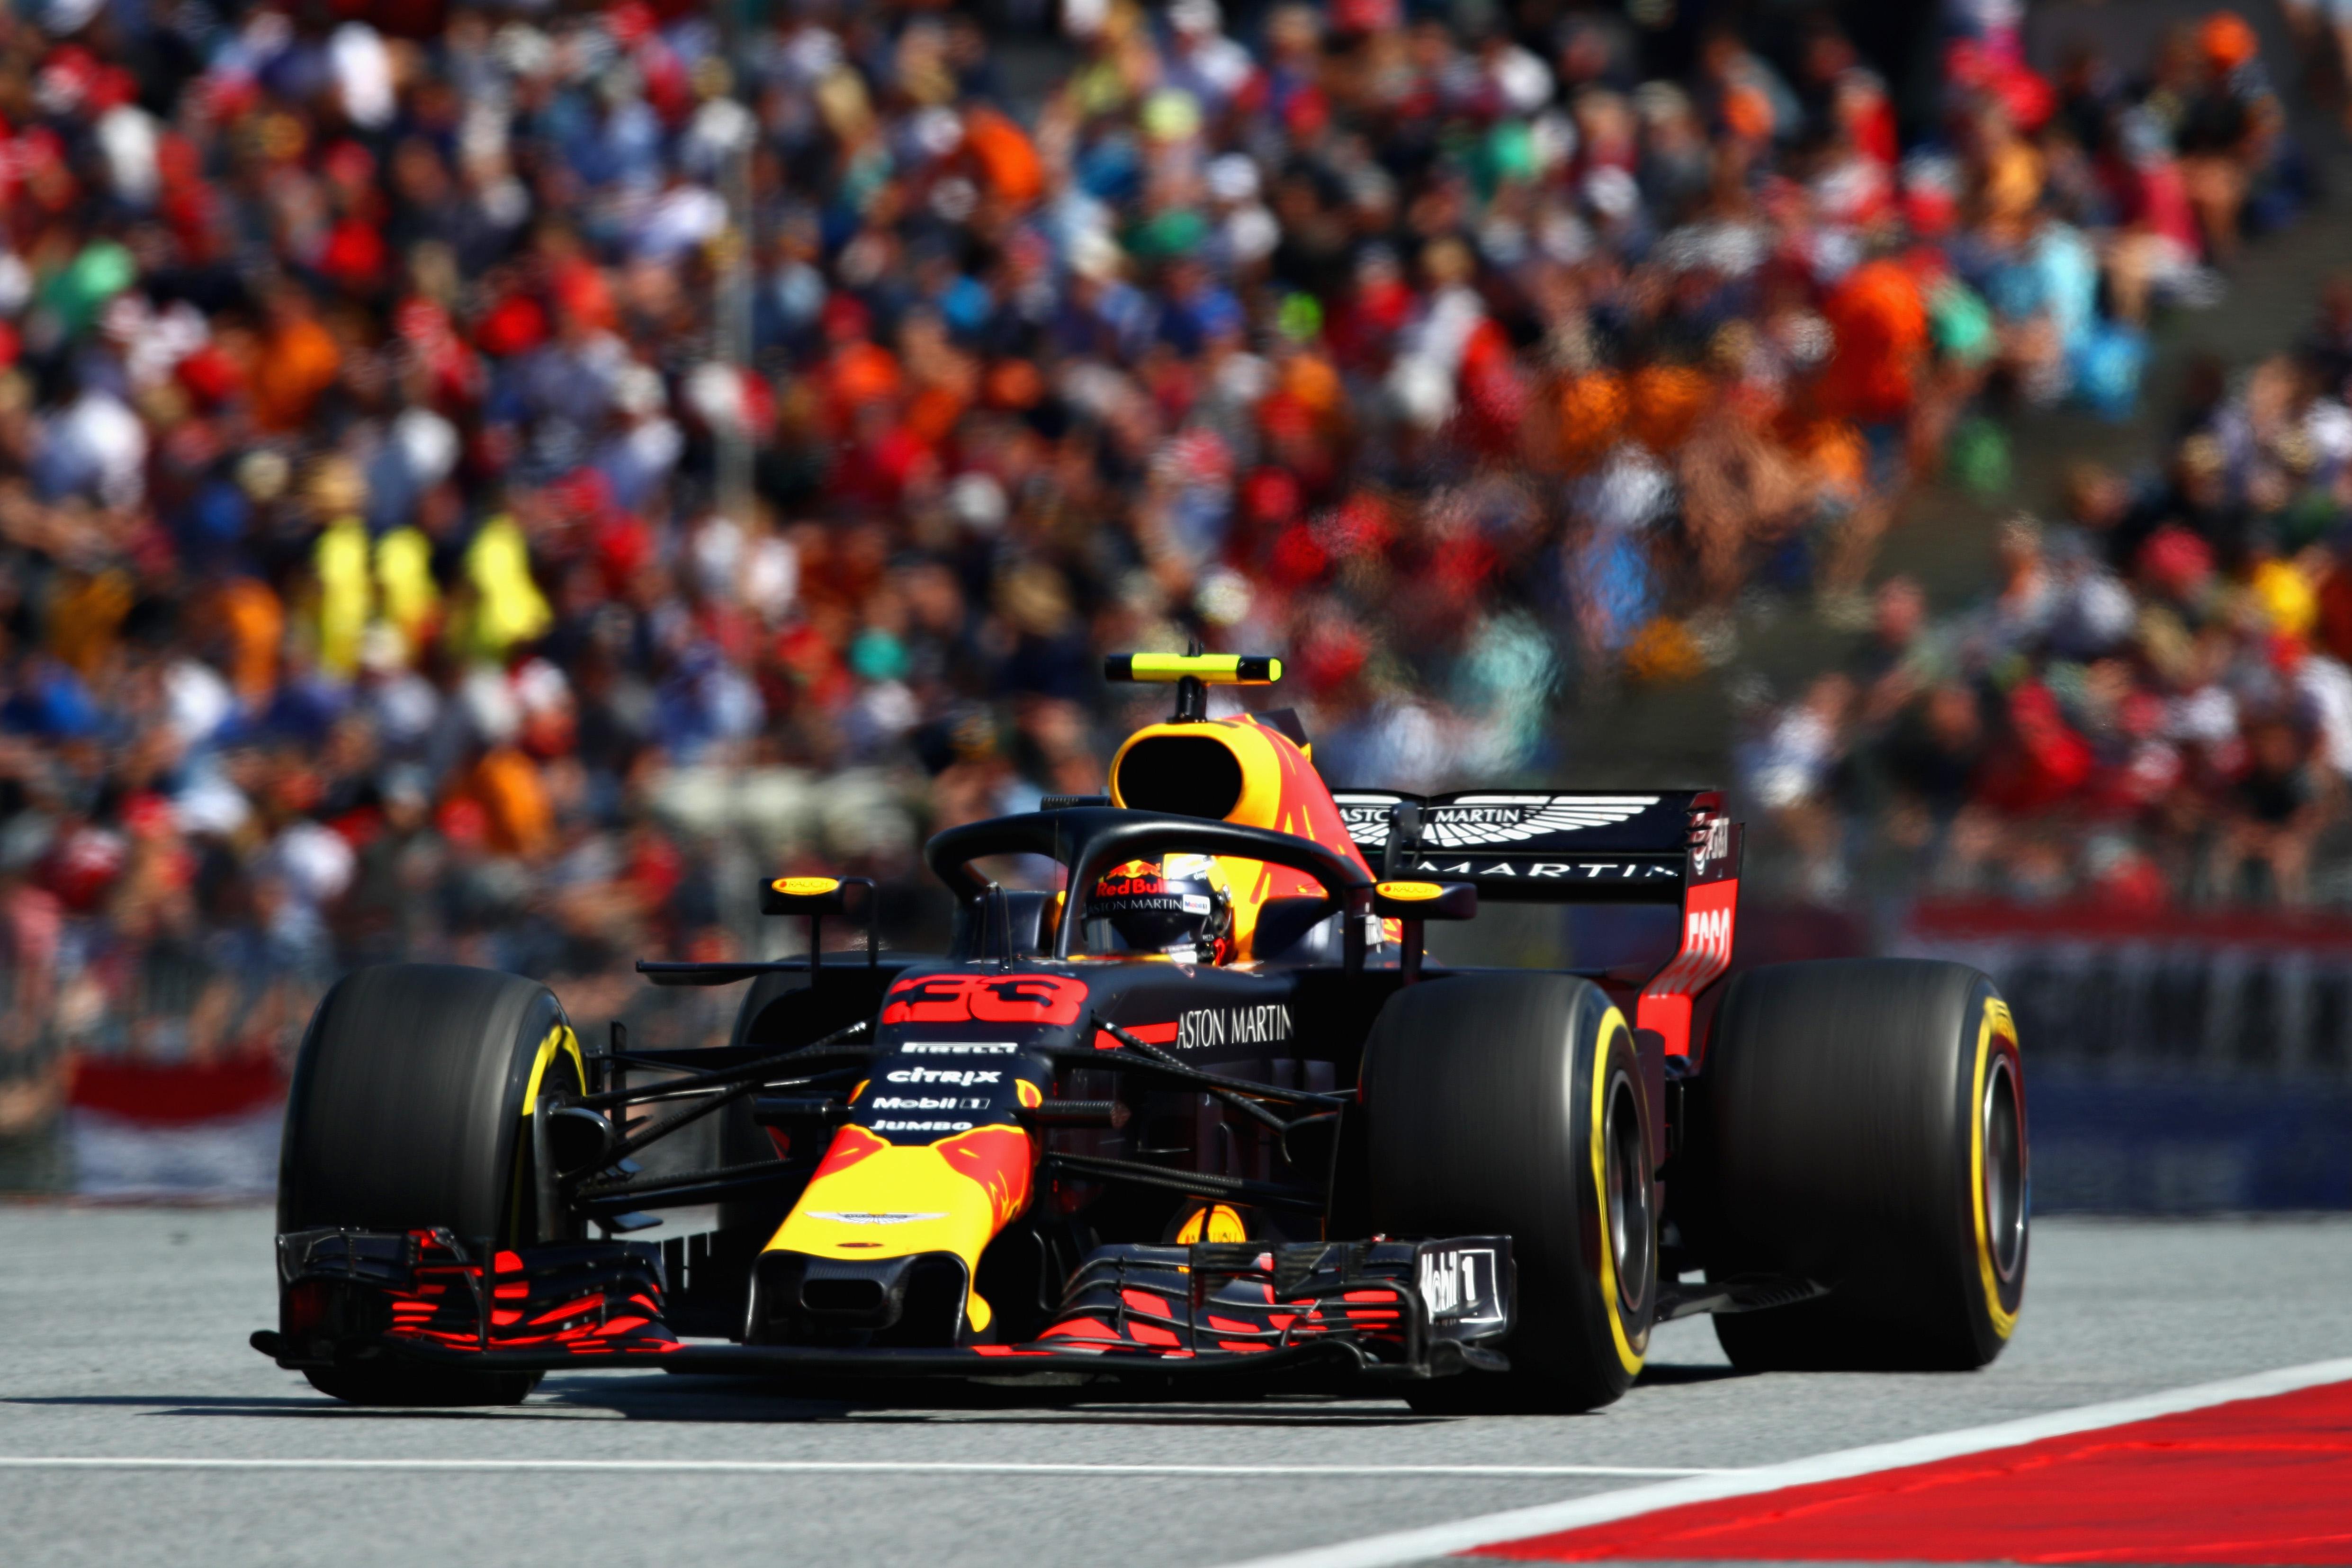 Max valt uit in Grand Prix van Groot-Brittannië: